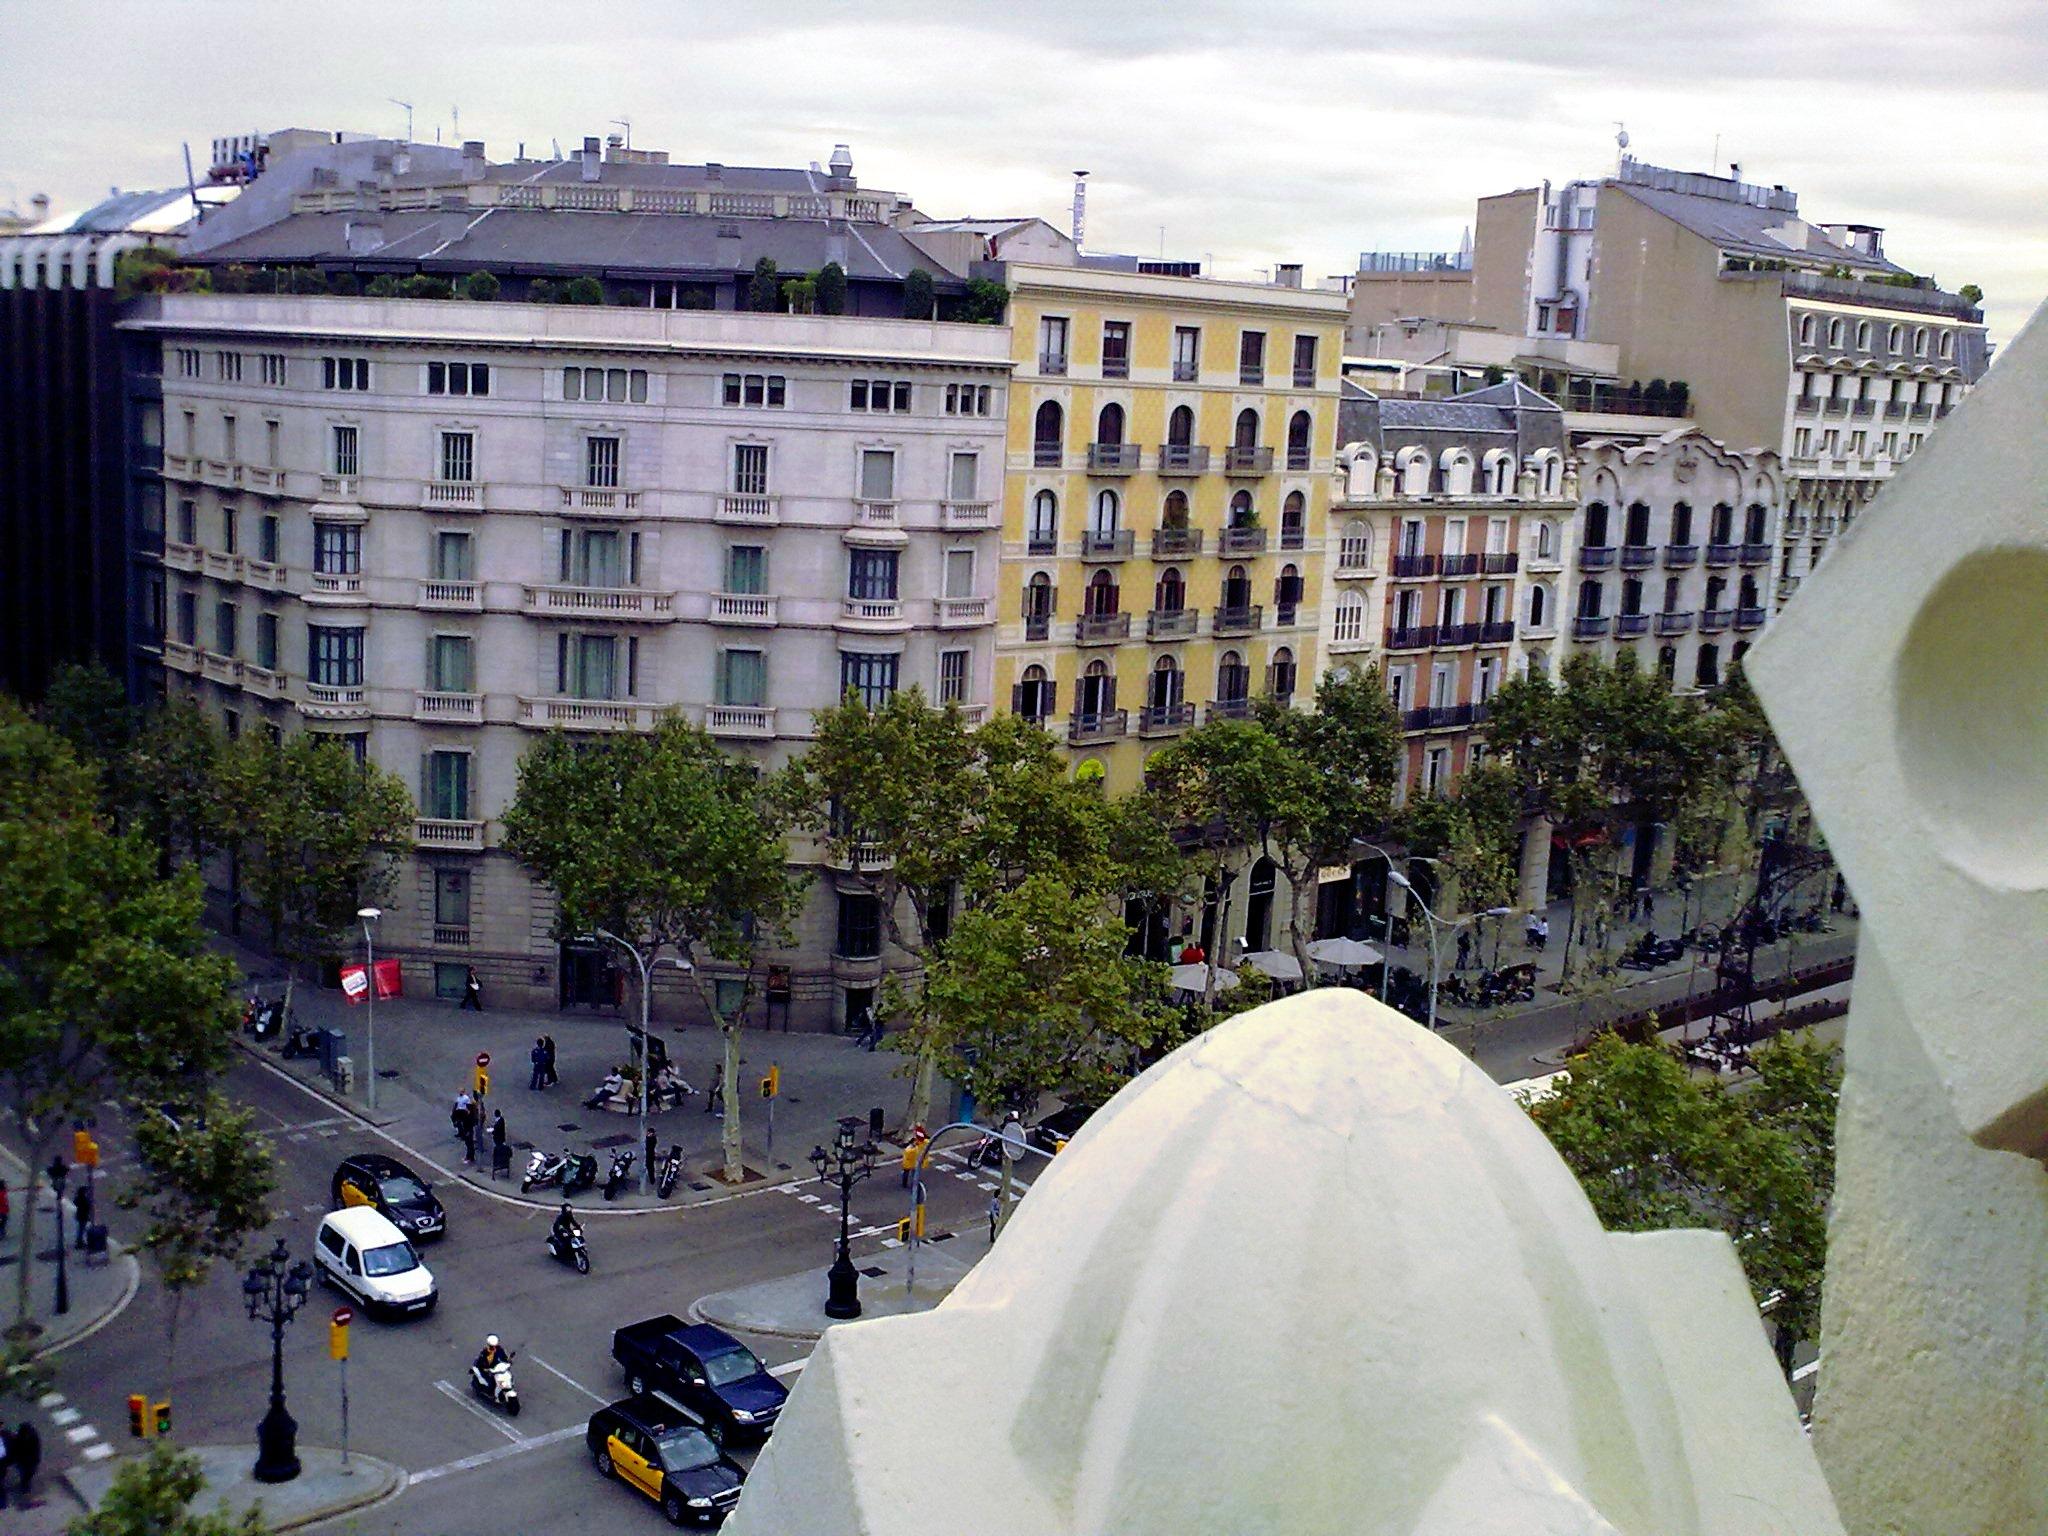 filecrulla del carrer de mallorca amb passeig de grcia desde la terrassa